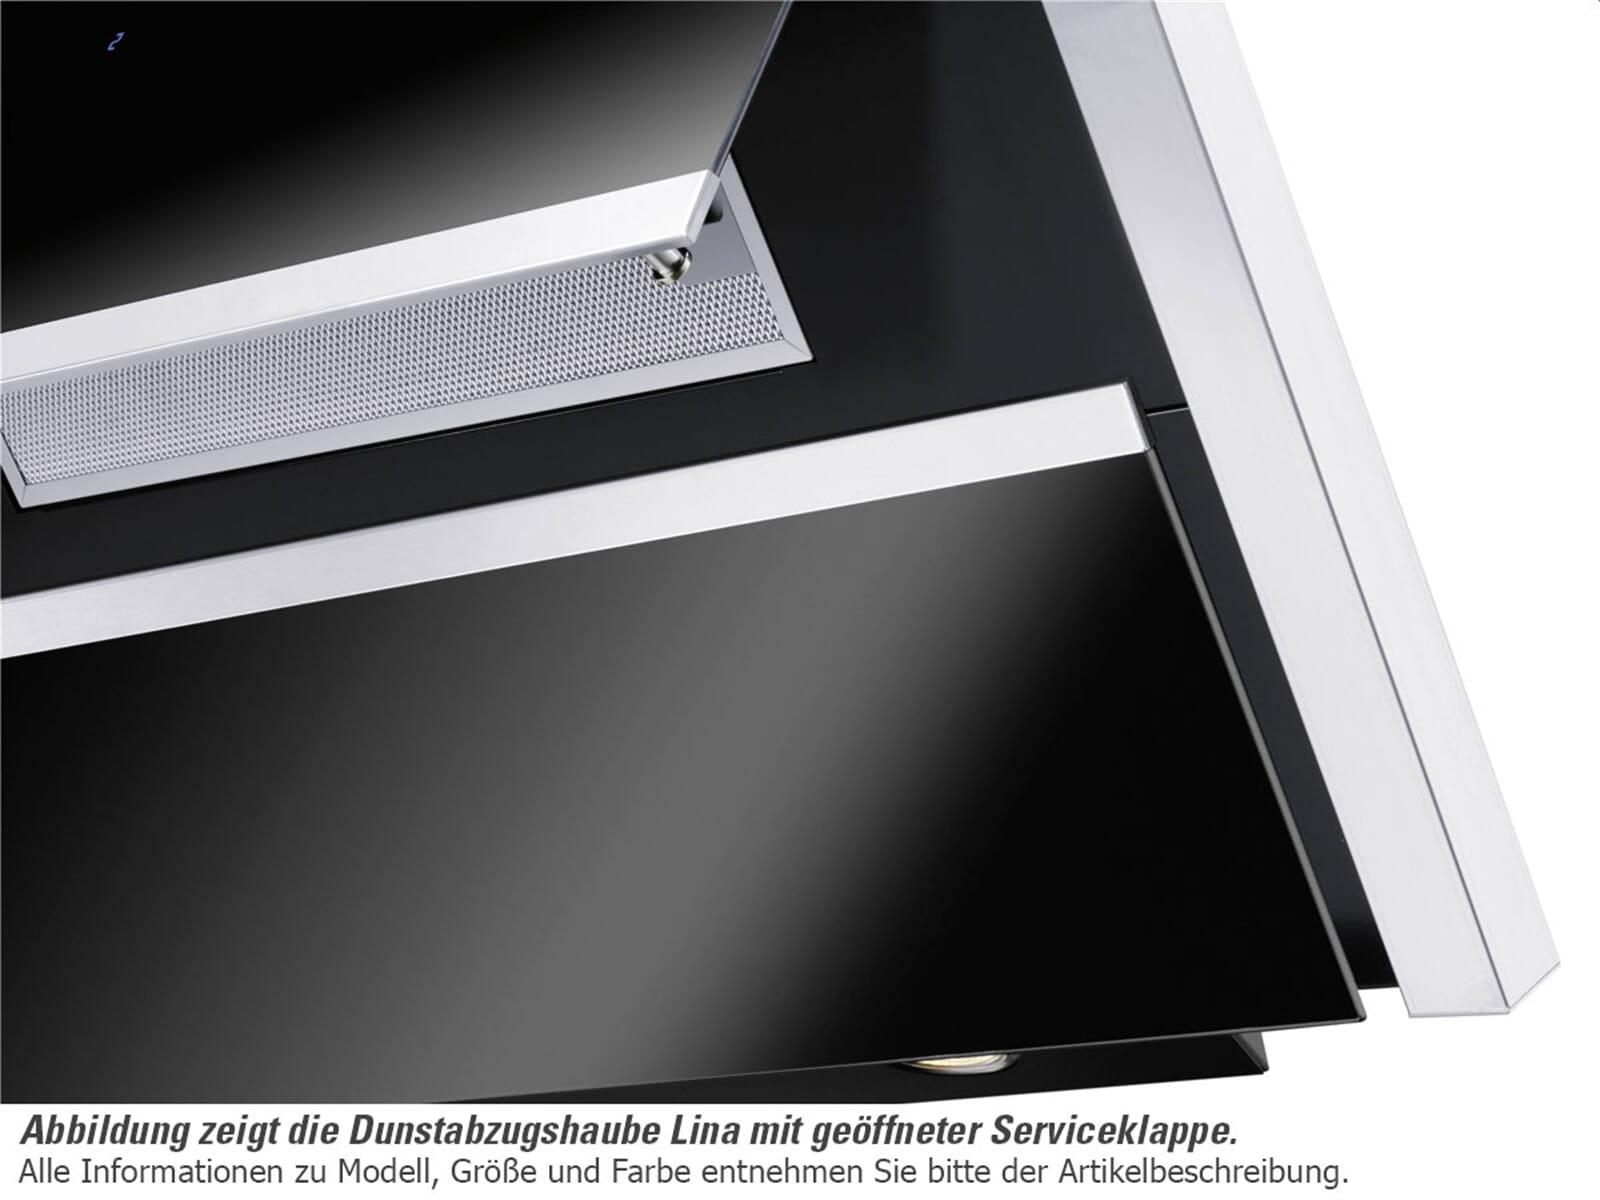 oranier lina 90 s 8713 92 kopffrei wand dunstabzugshaube edelstahl schwarz f r 808 90 eur. Black Bedroom Furniture Sets. Home Design Ideas